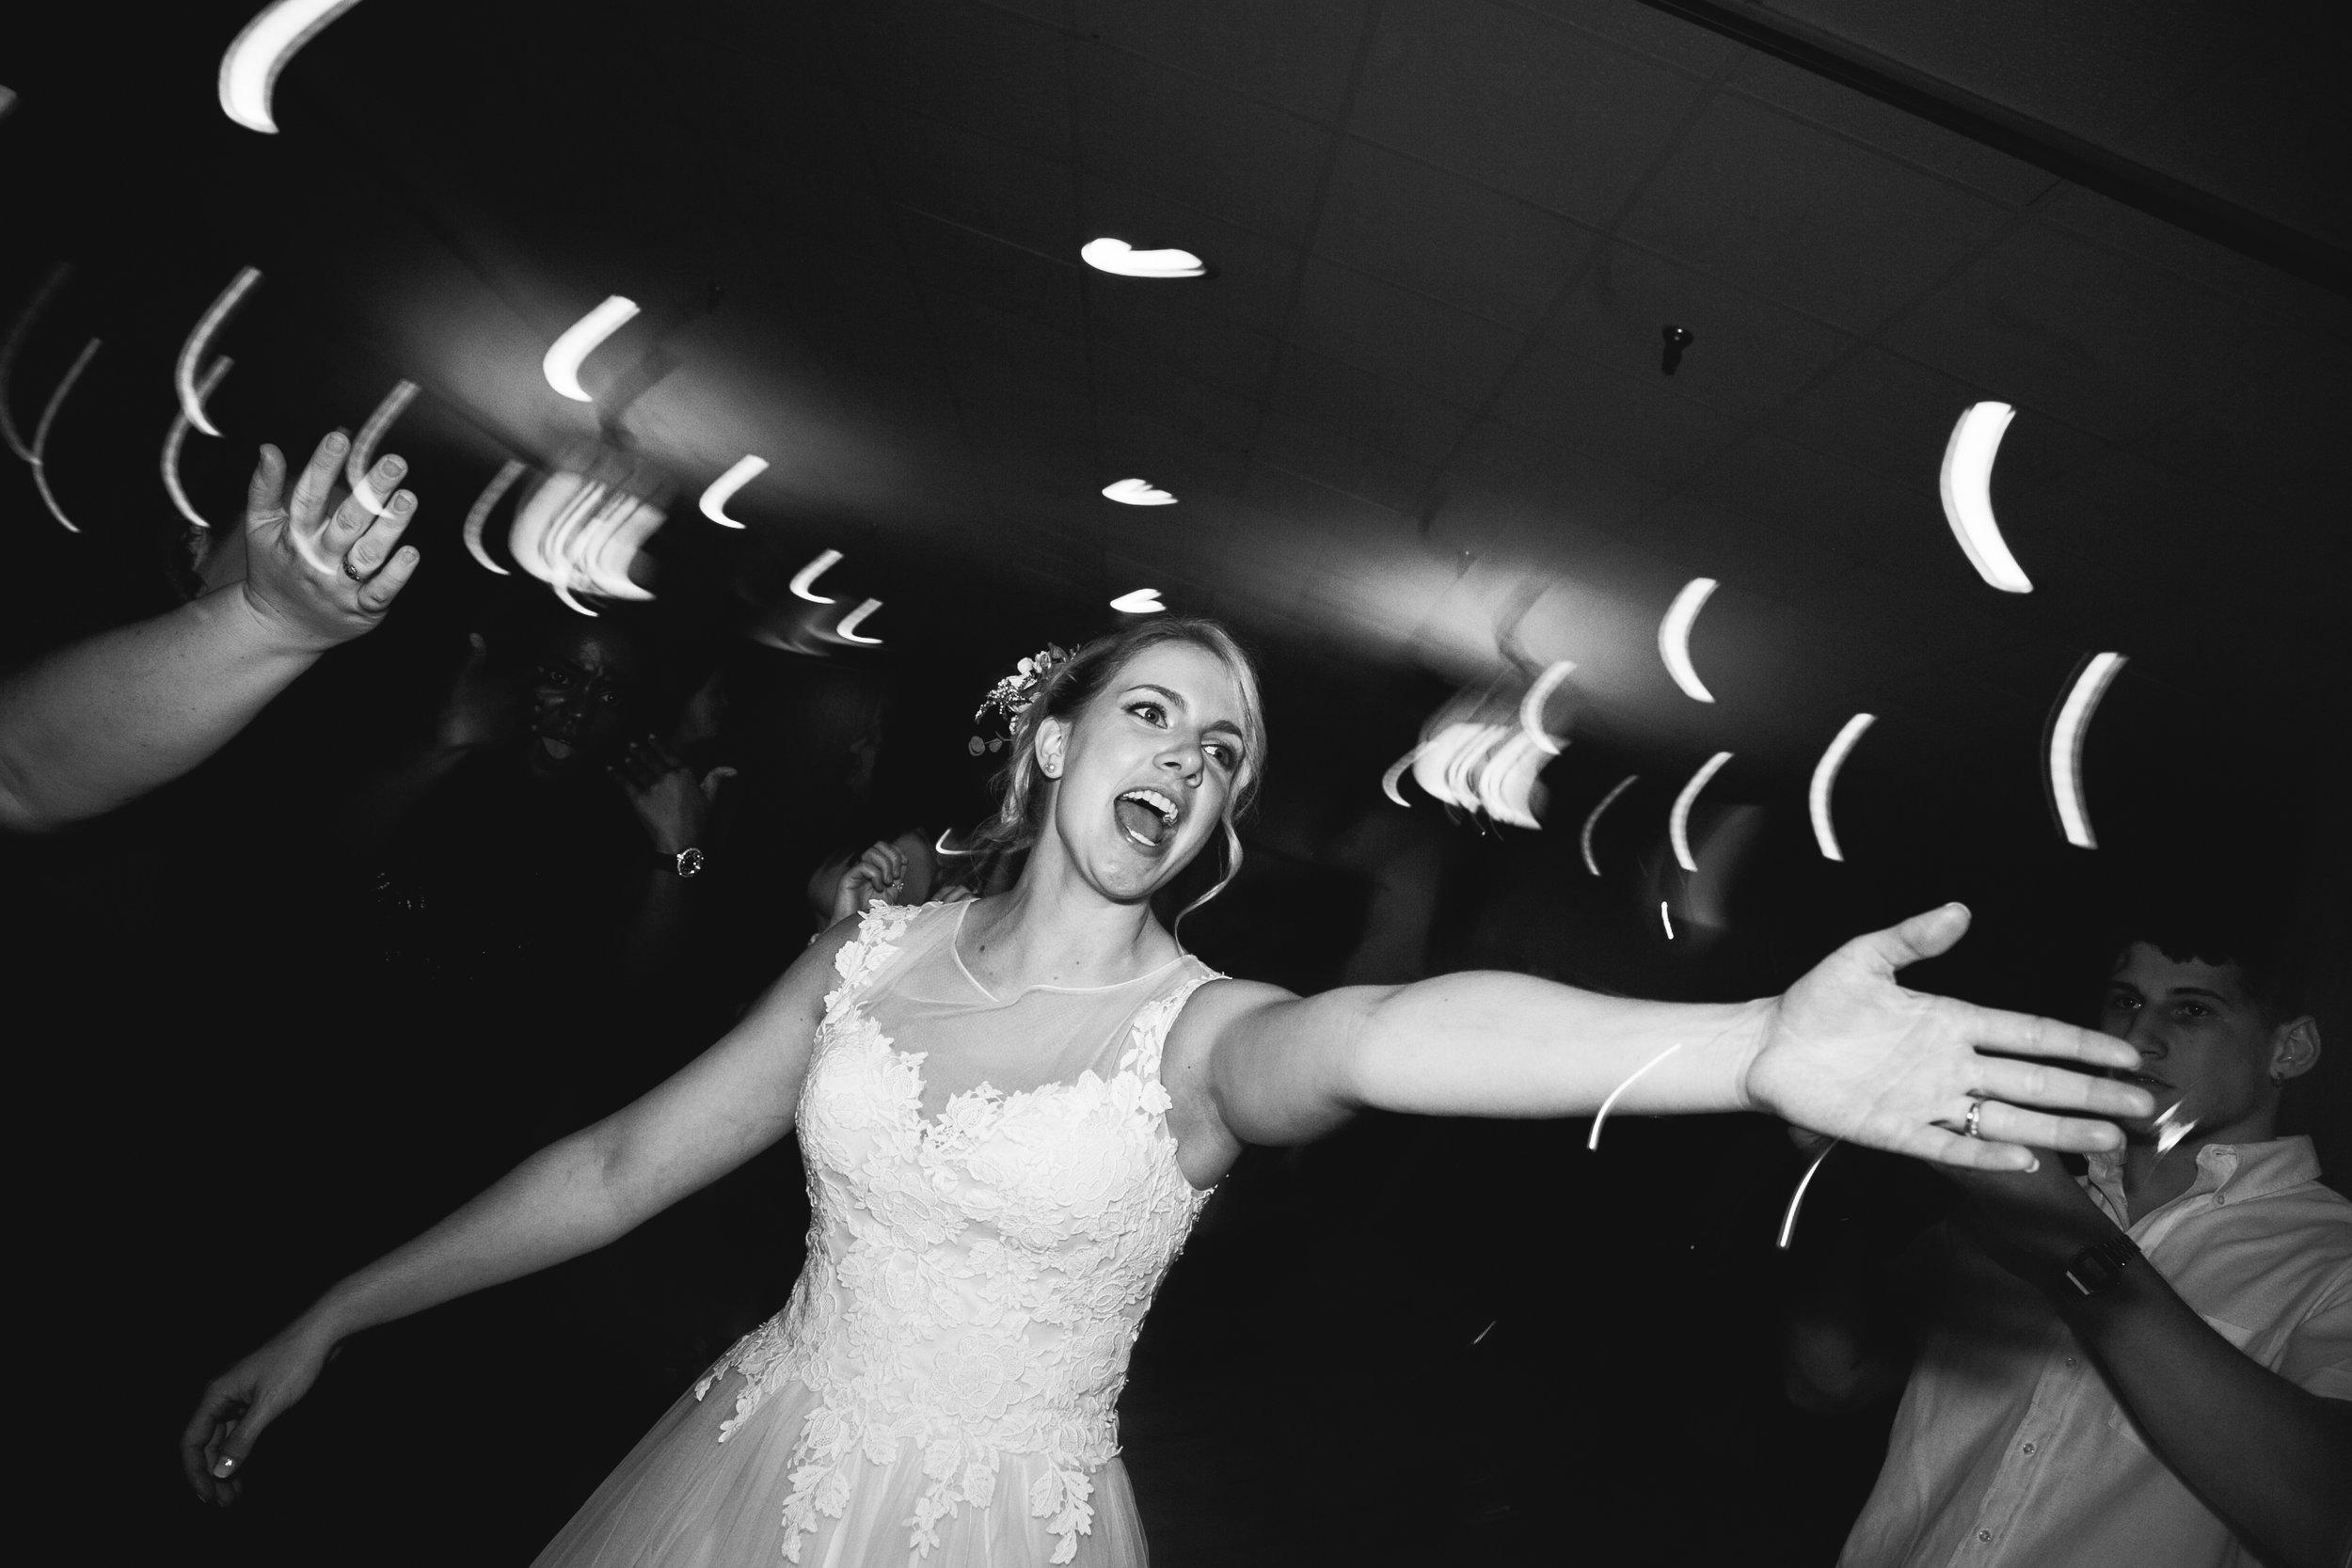 LA LUNA BANQUET HALL WEDDING BENSALEM - 135.jpg